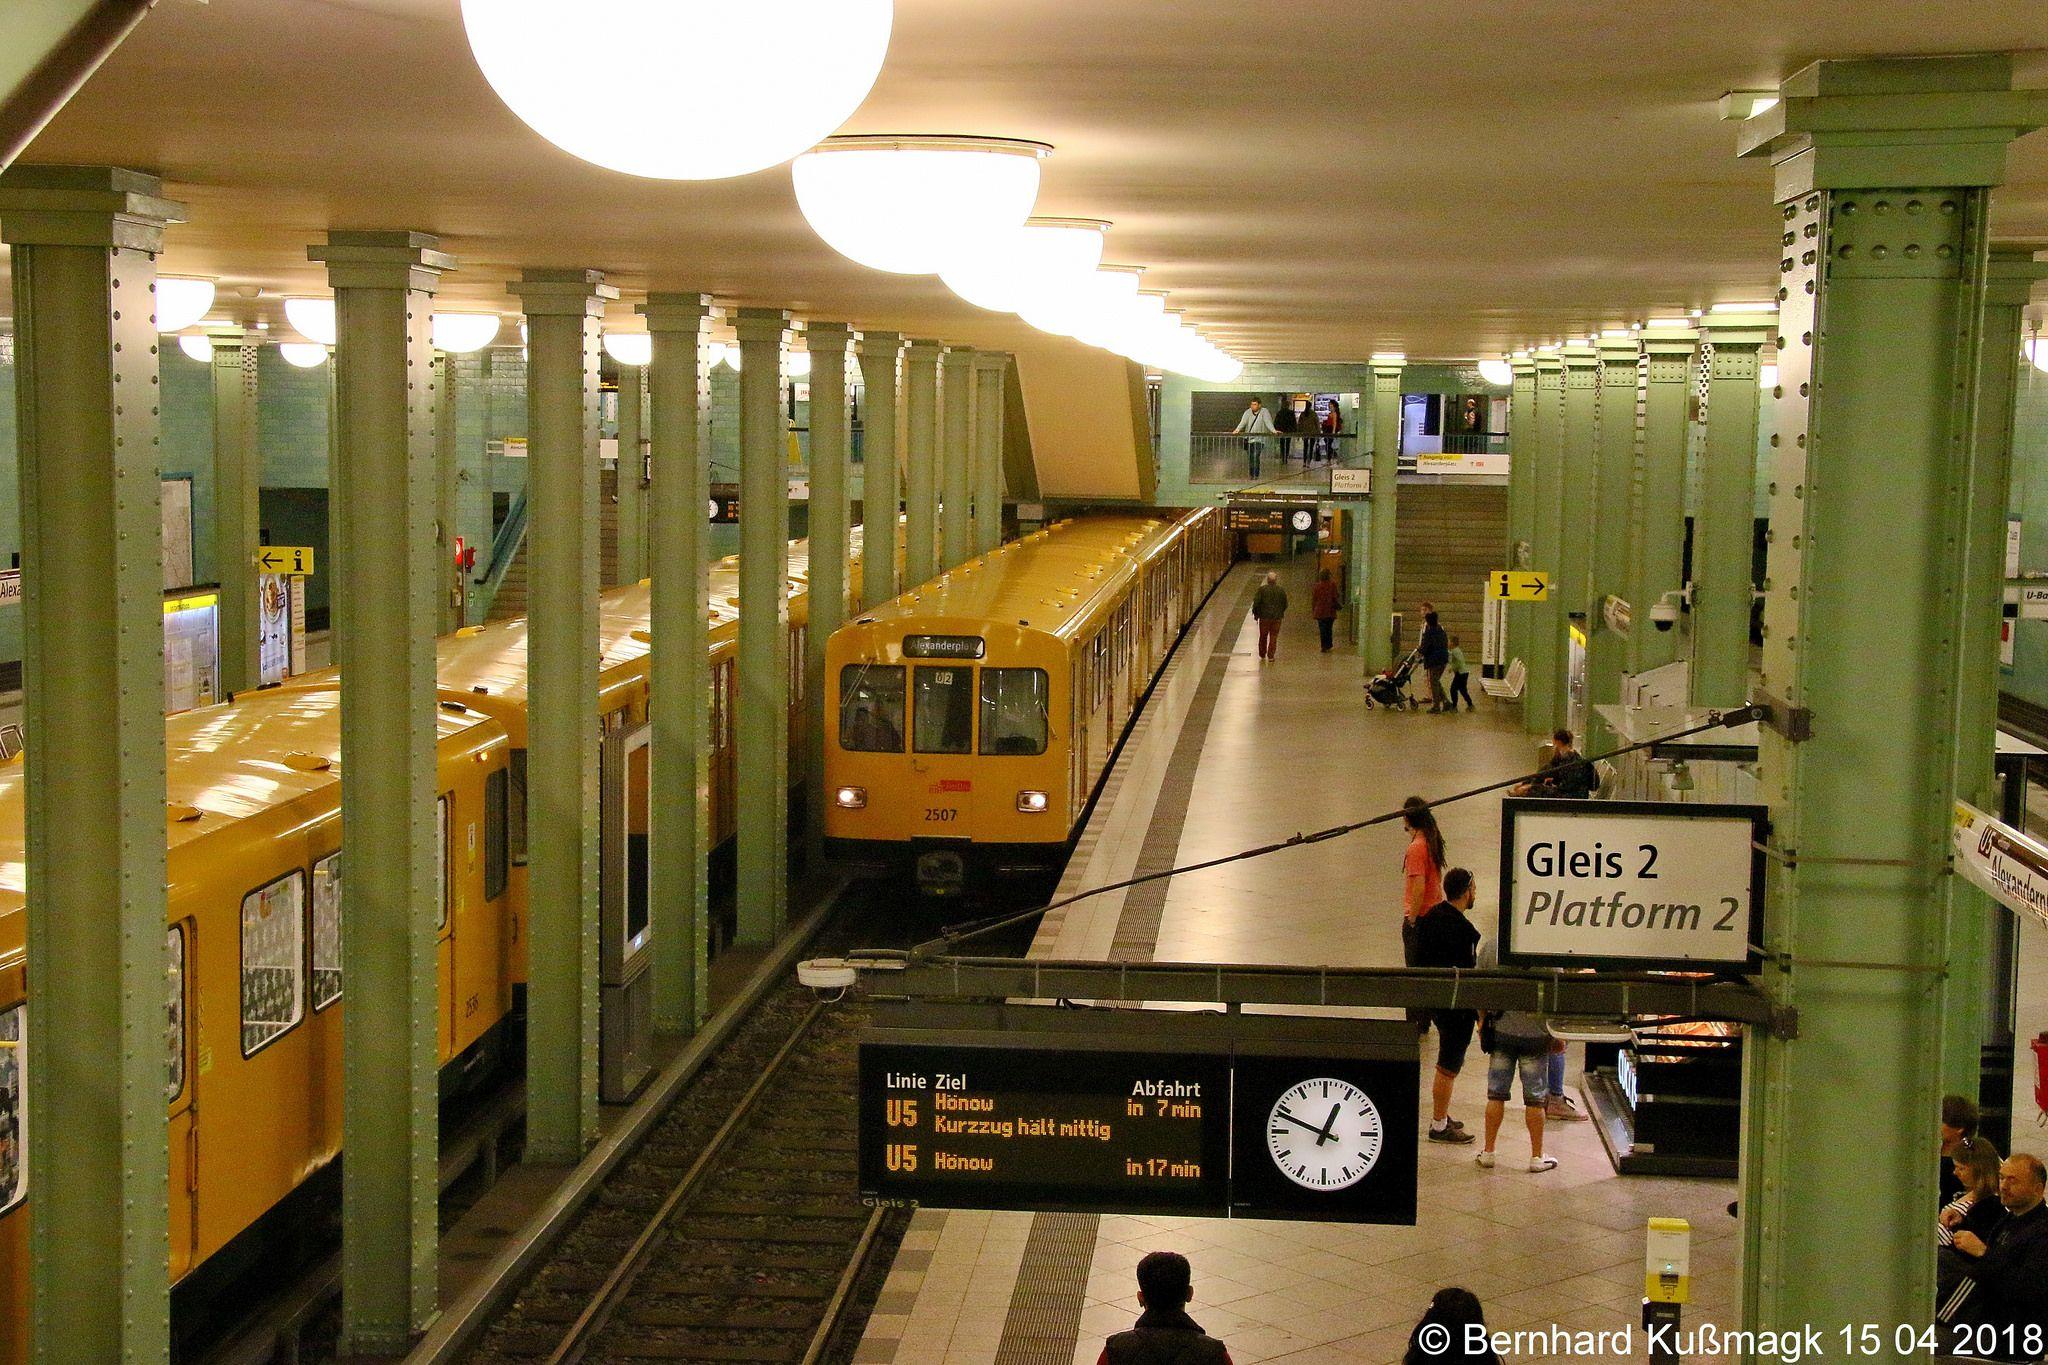 Europa Deutschland Berlin Mitte U Bahnhof Alexanderplatz U Bahn Linie U5 Berlin Germany Model Railroad